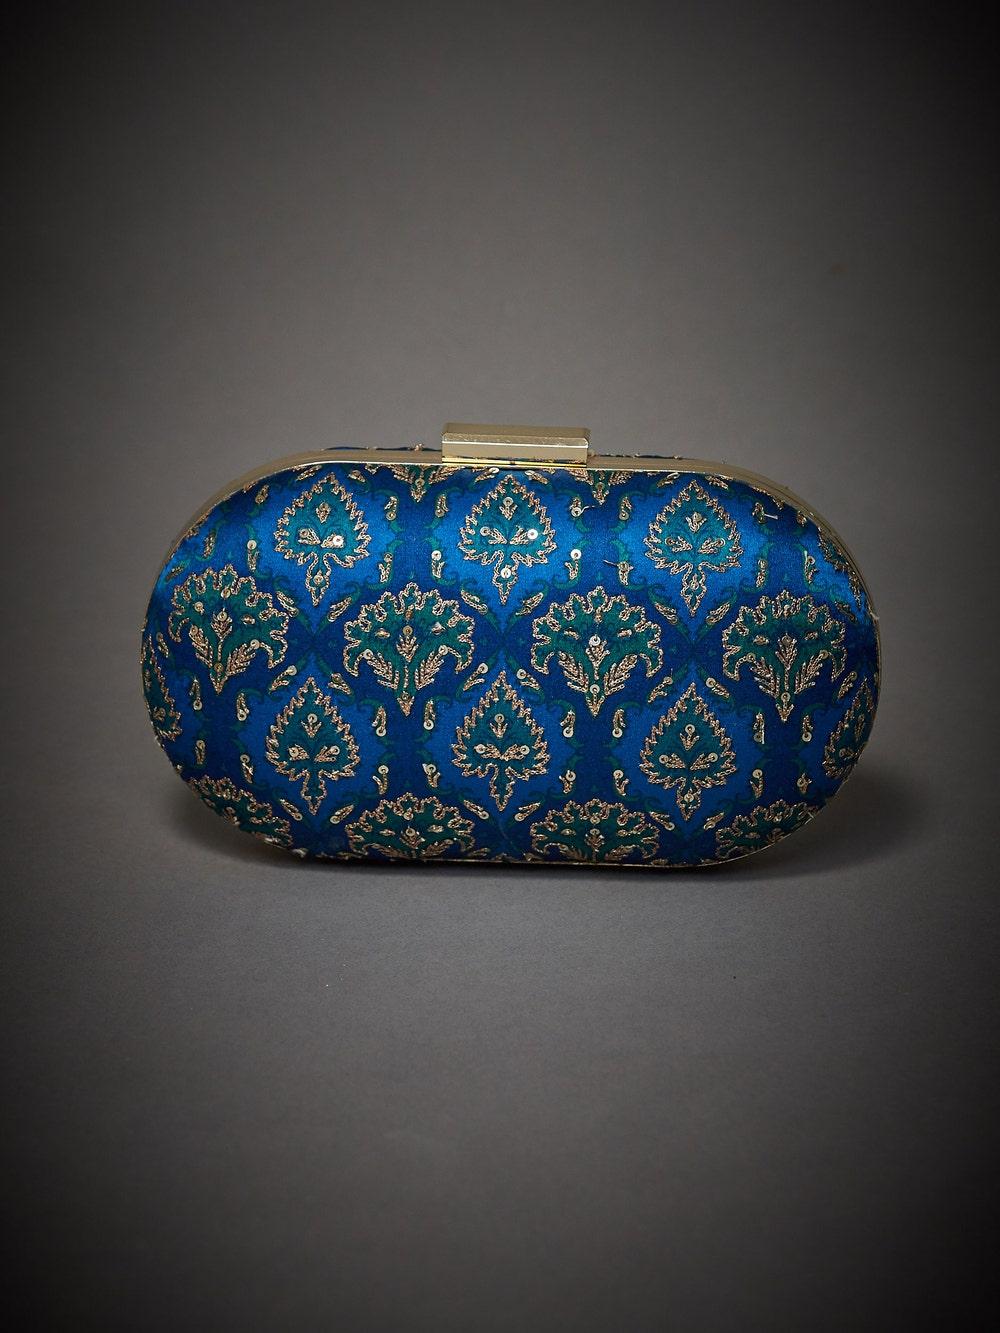 Royal Blue Embroidered Anantnag Clutch